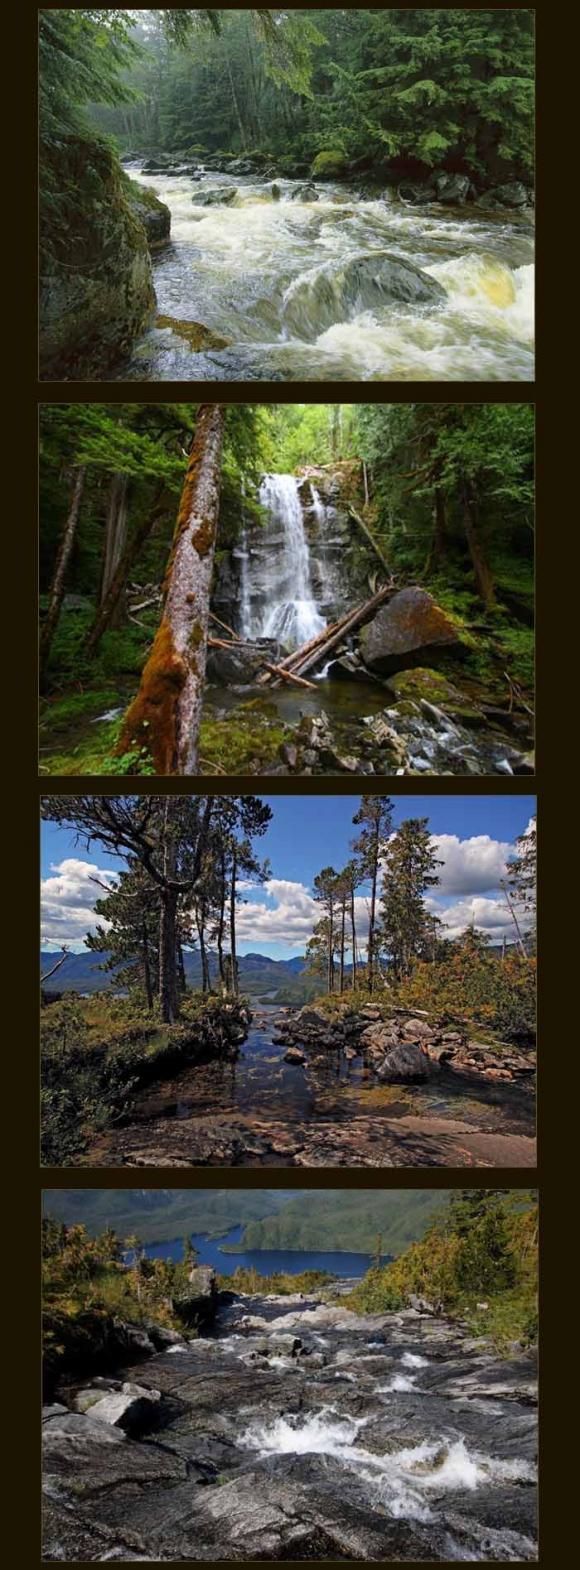 http://terre-a-terre.cowblog.fr/images/fPRI1m60618ed.jpg